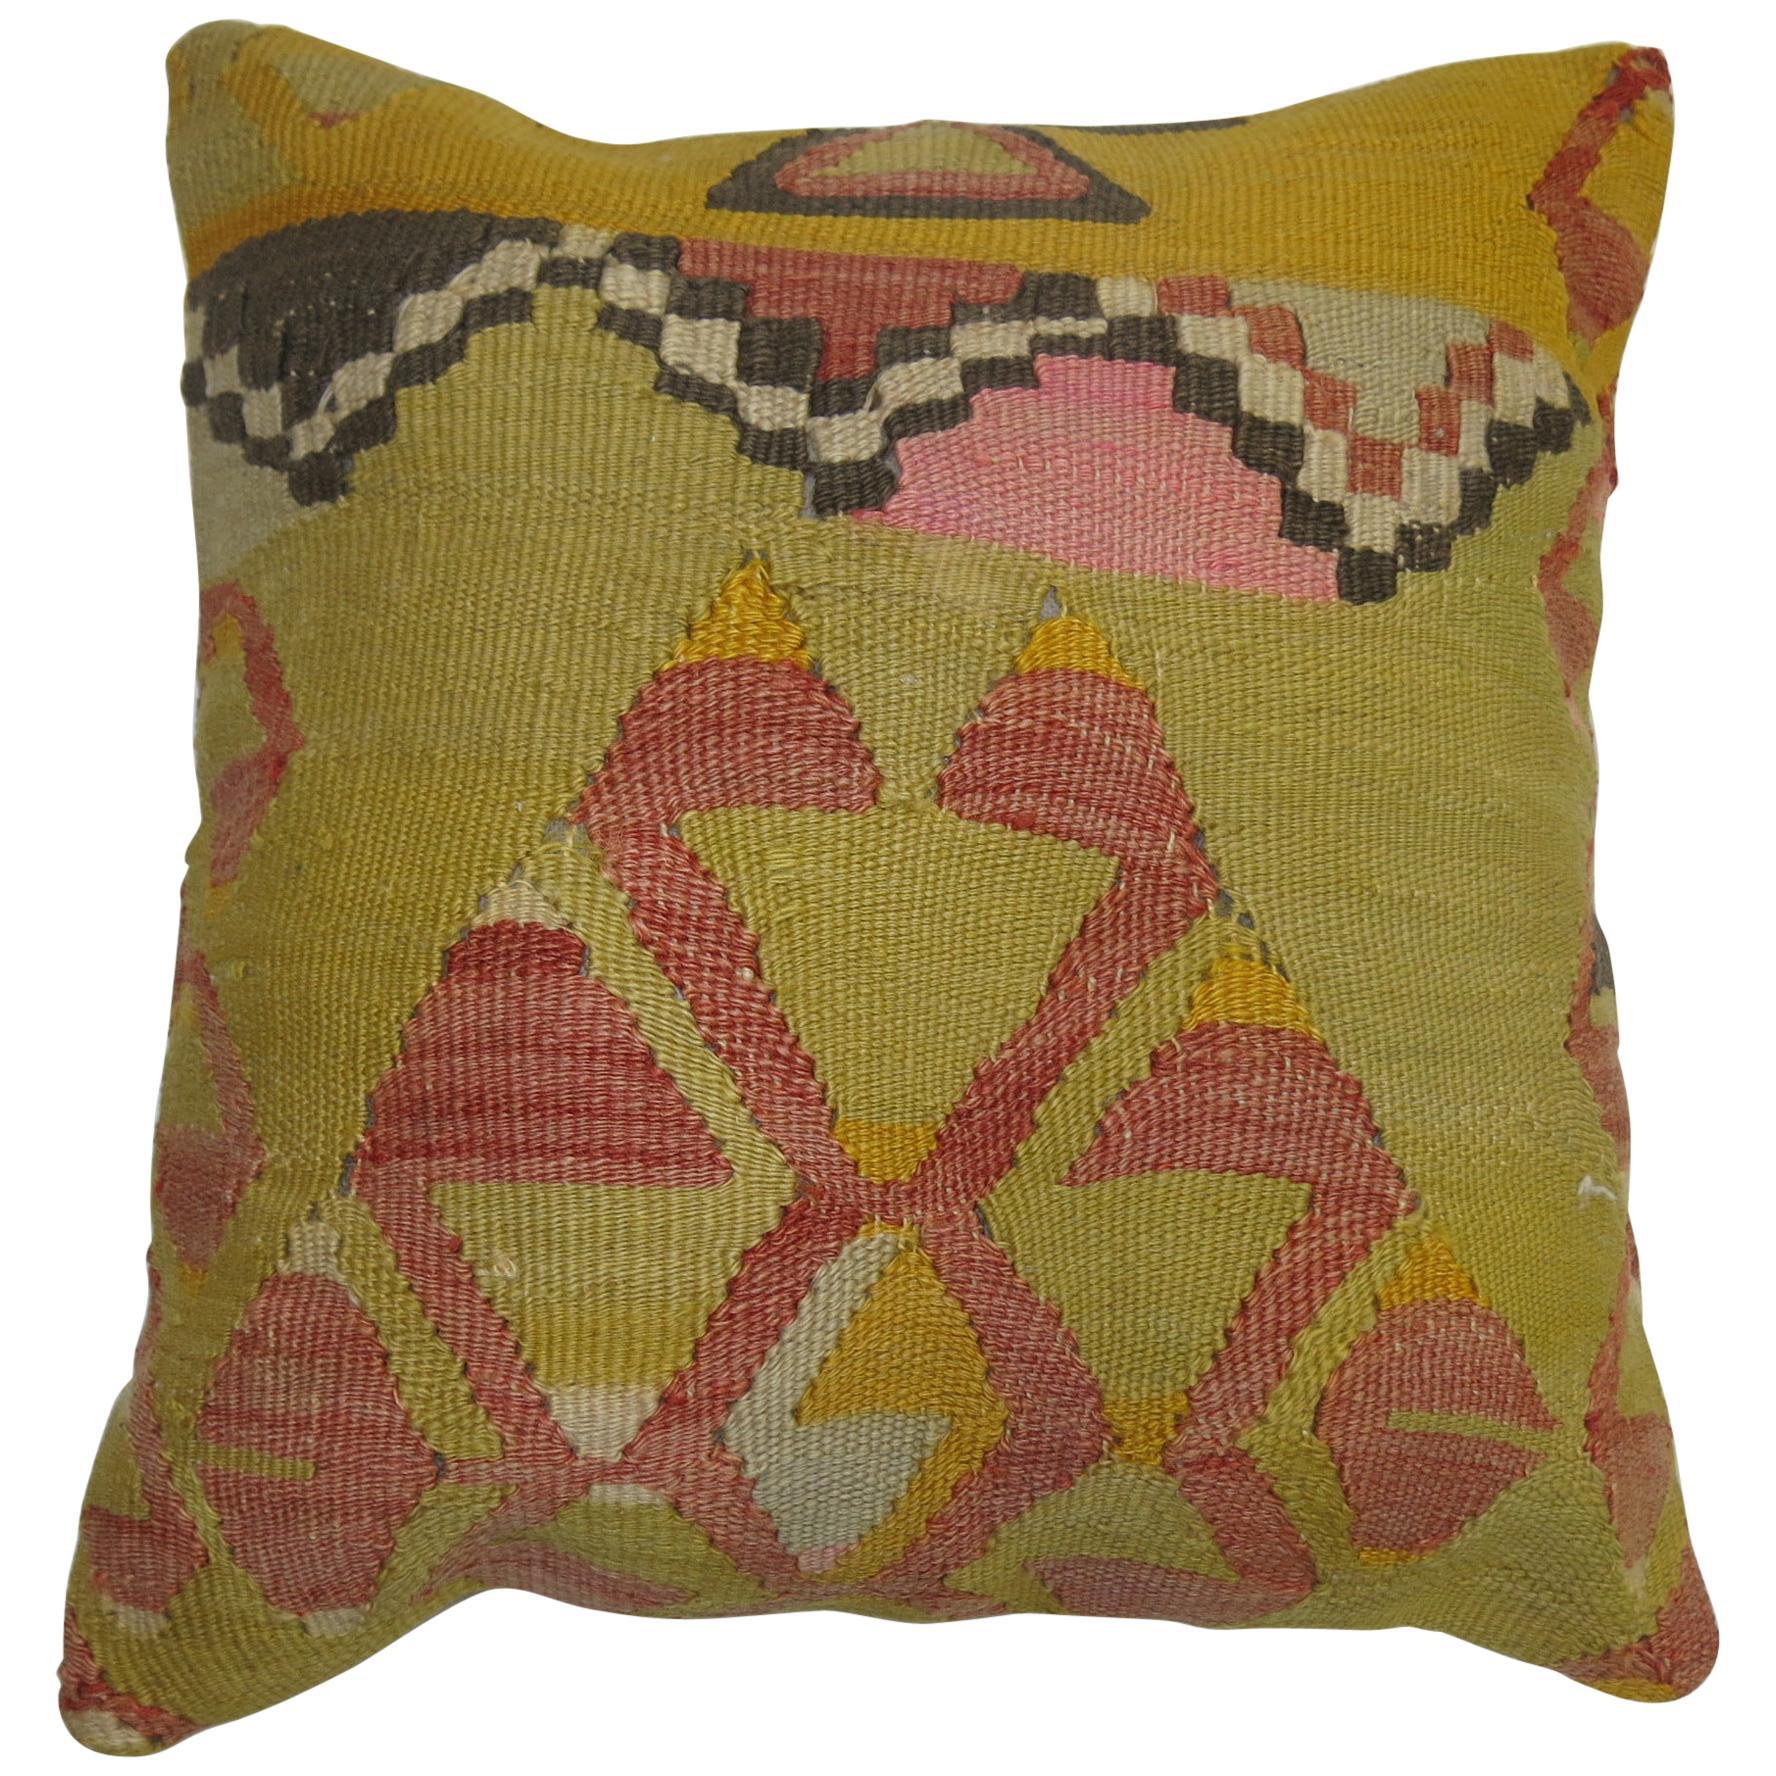 Neon Green and Pink Turkish Kilim Pillow